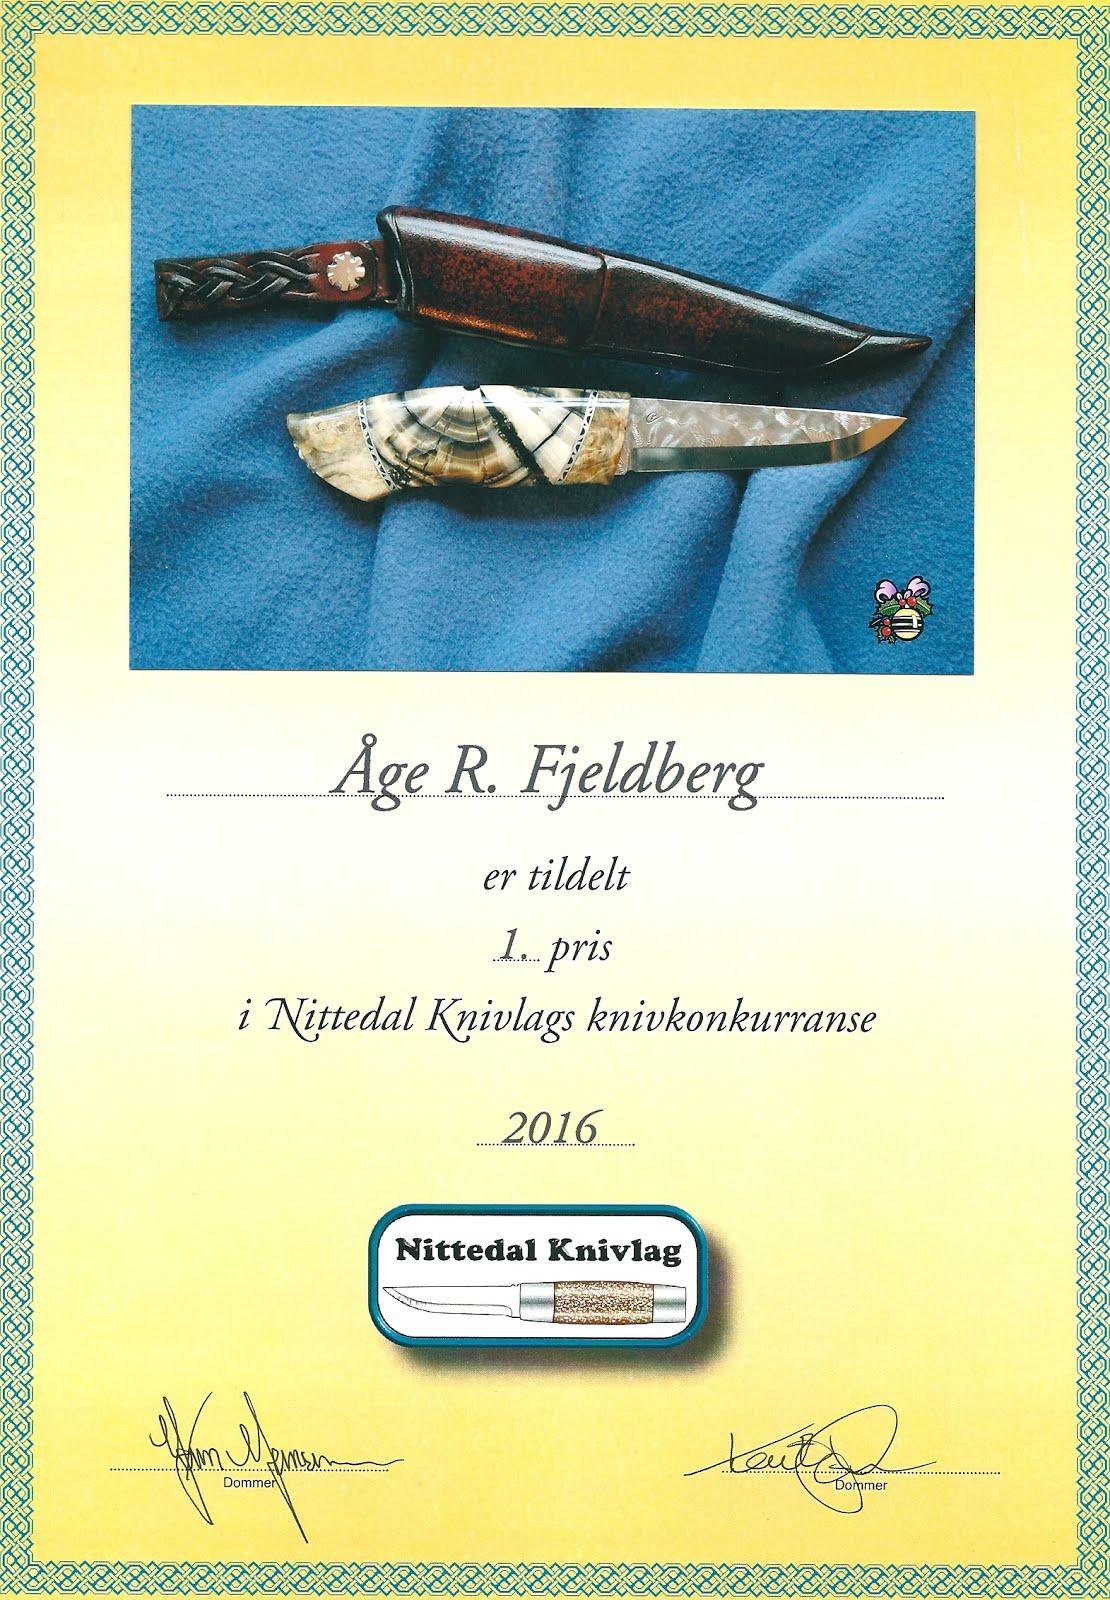 Nittedal Knivlag 2016